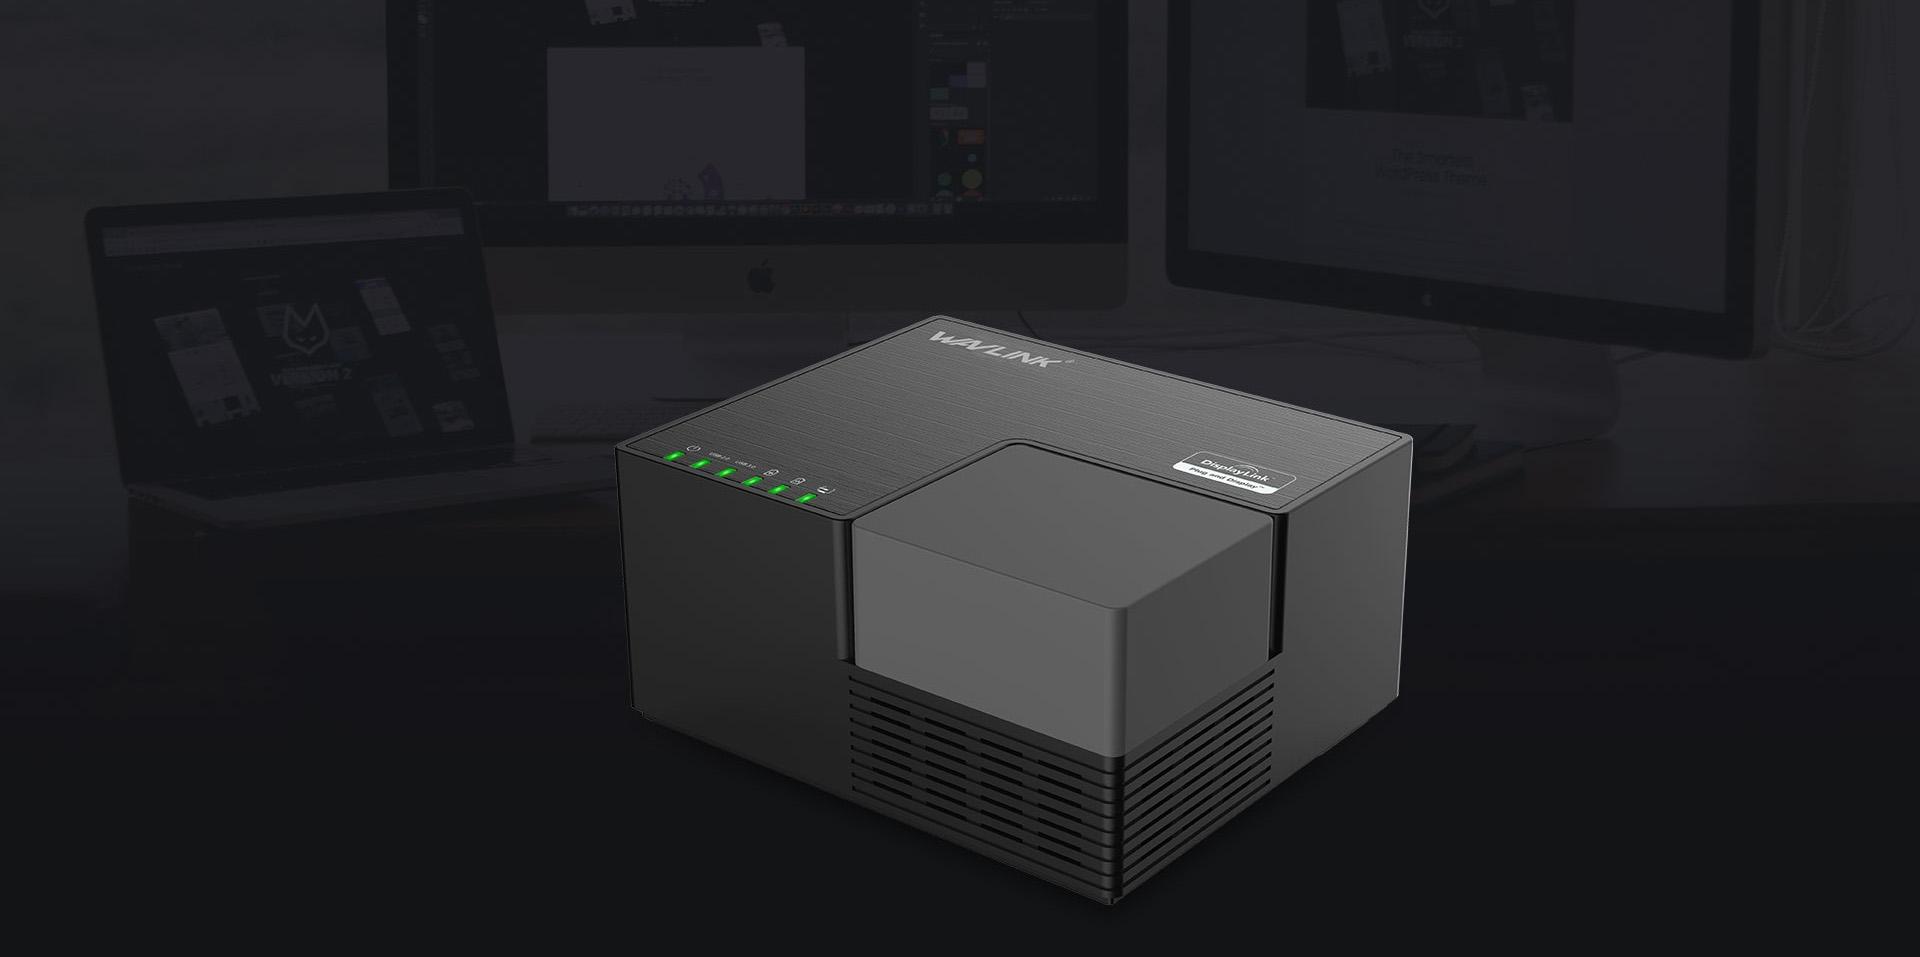 UG39DK3,USB3.0多功能扩展坞